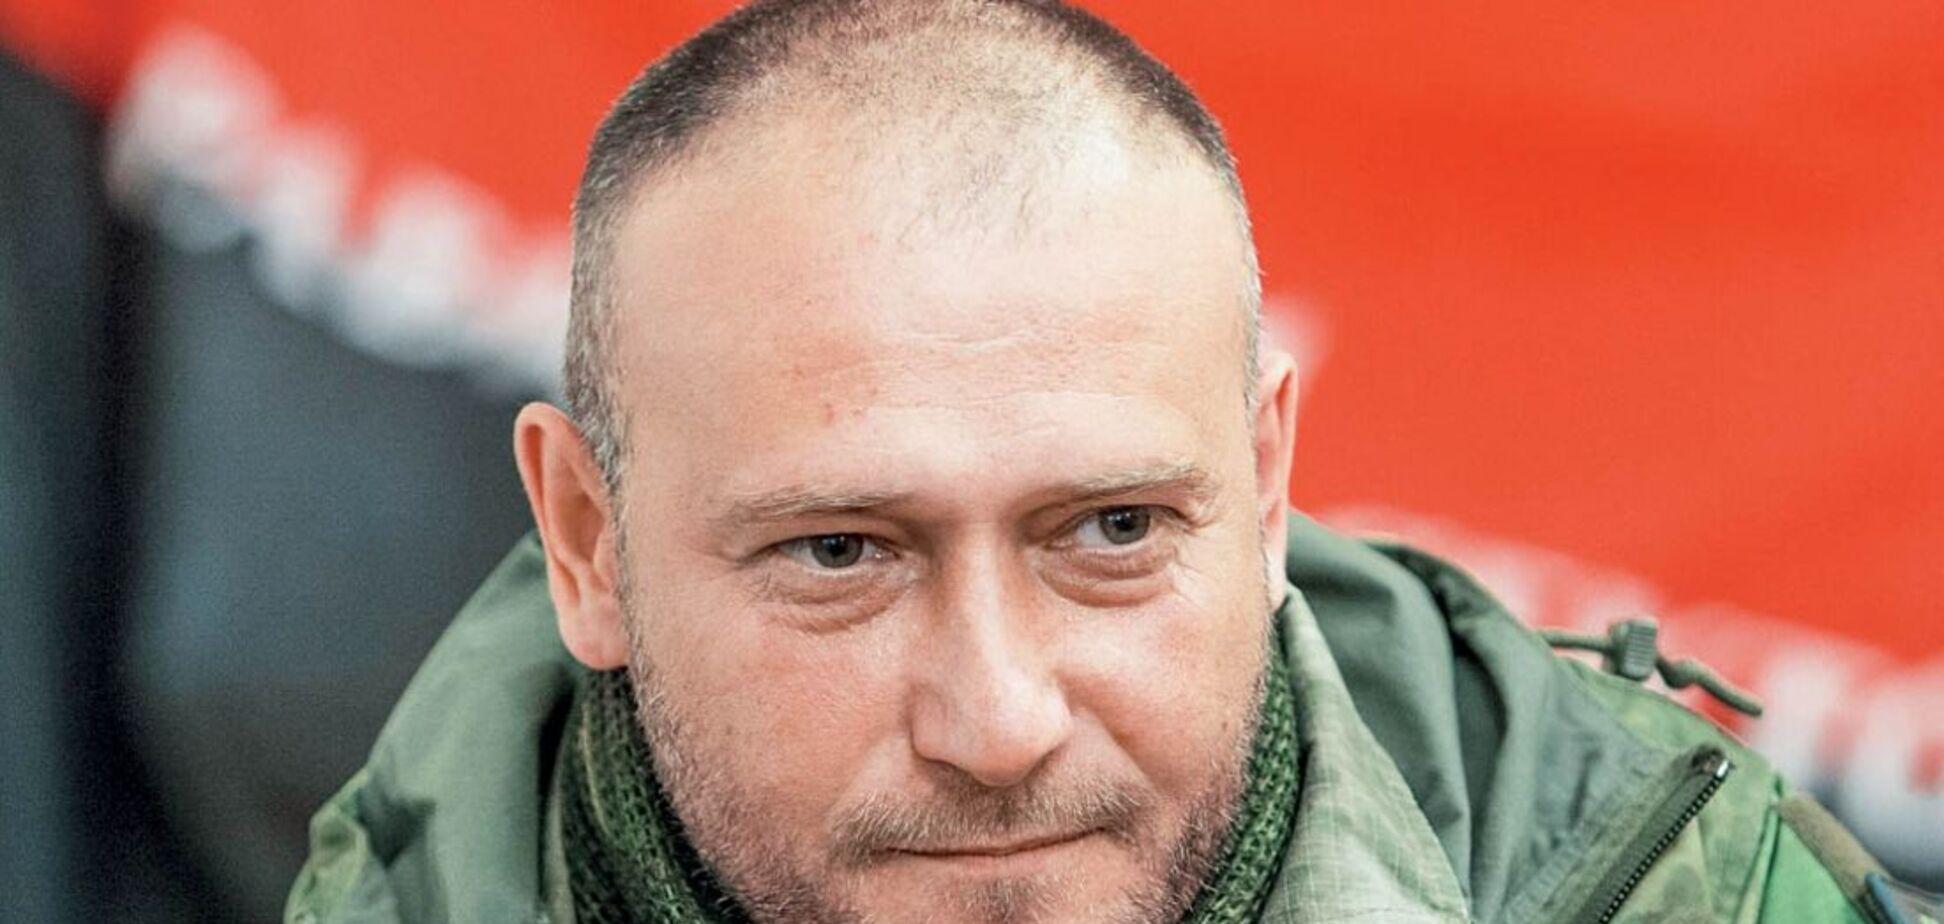 Дмитрий Ярош поддержал протесты в Беларуси